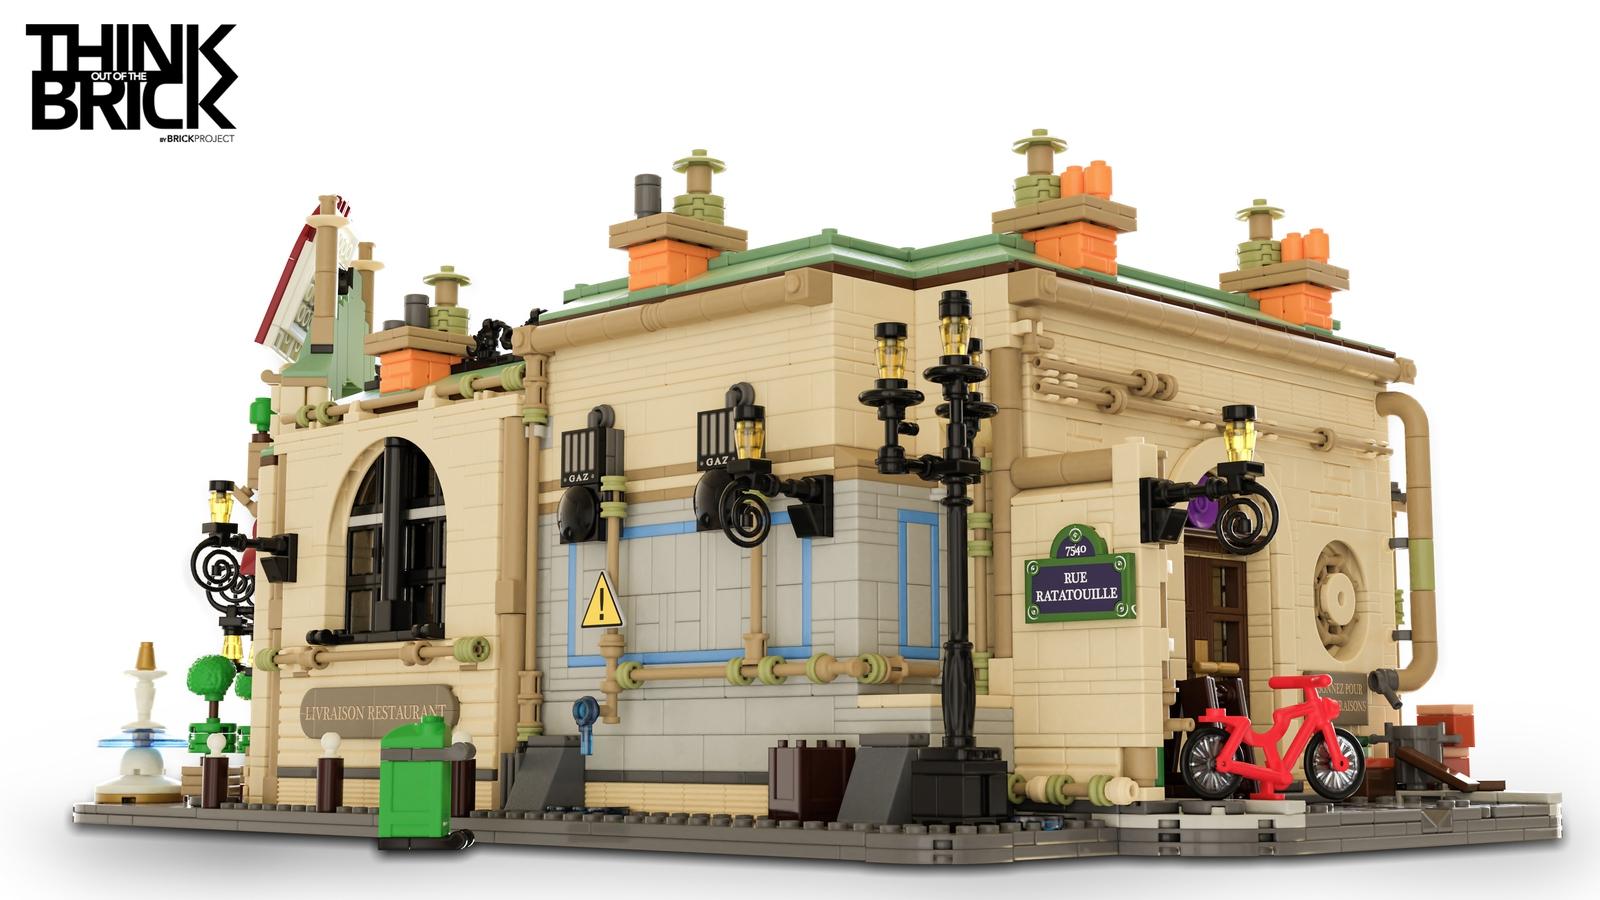 lego-ideas-ratatouille-open-the-doors-fassade-brick-project zusammengebaut.com